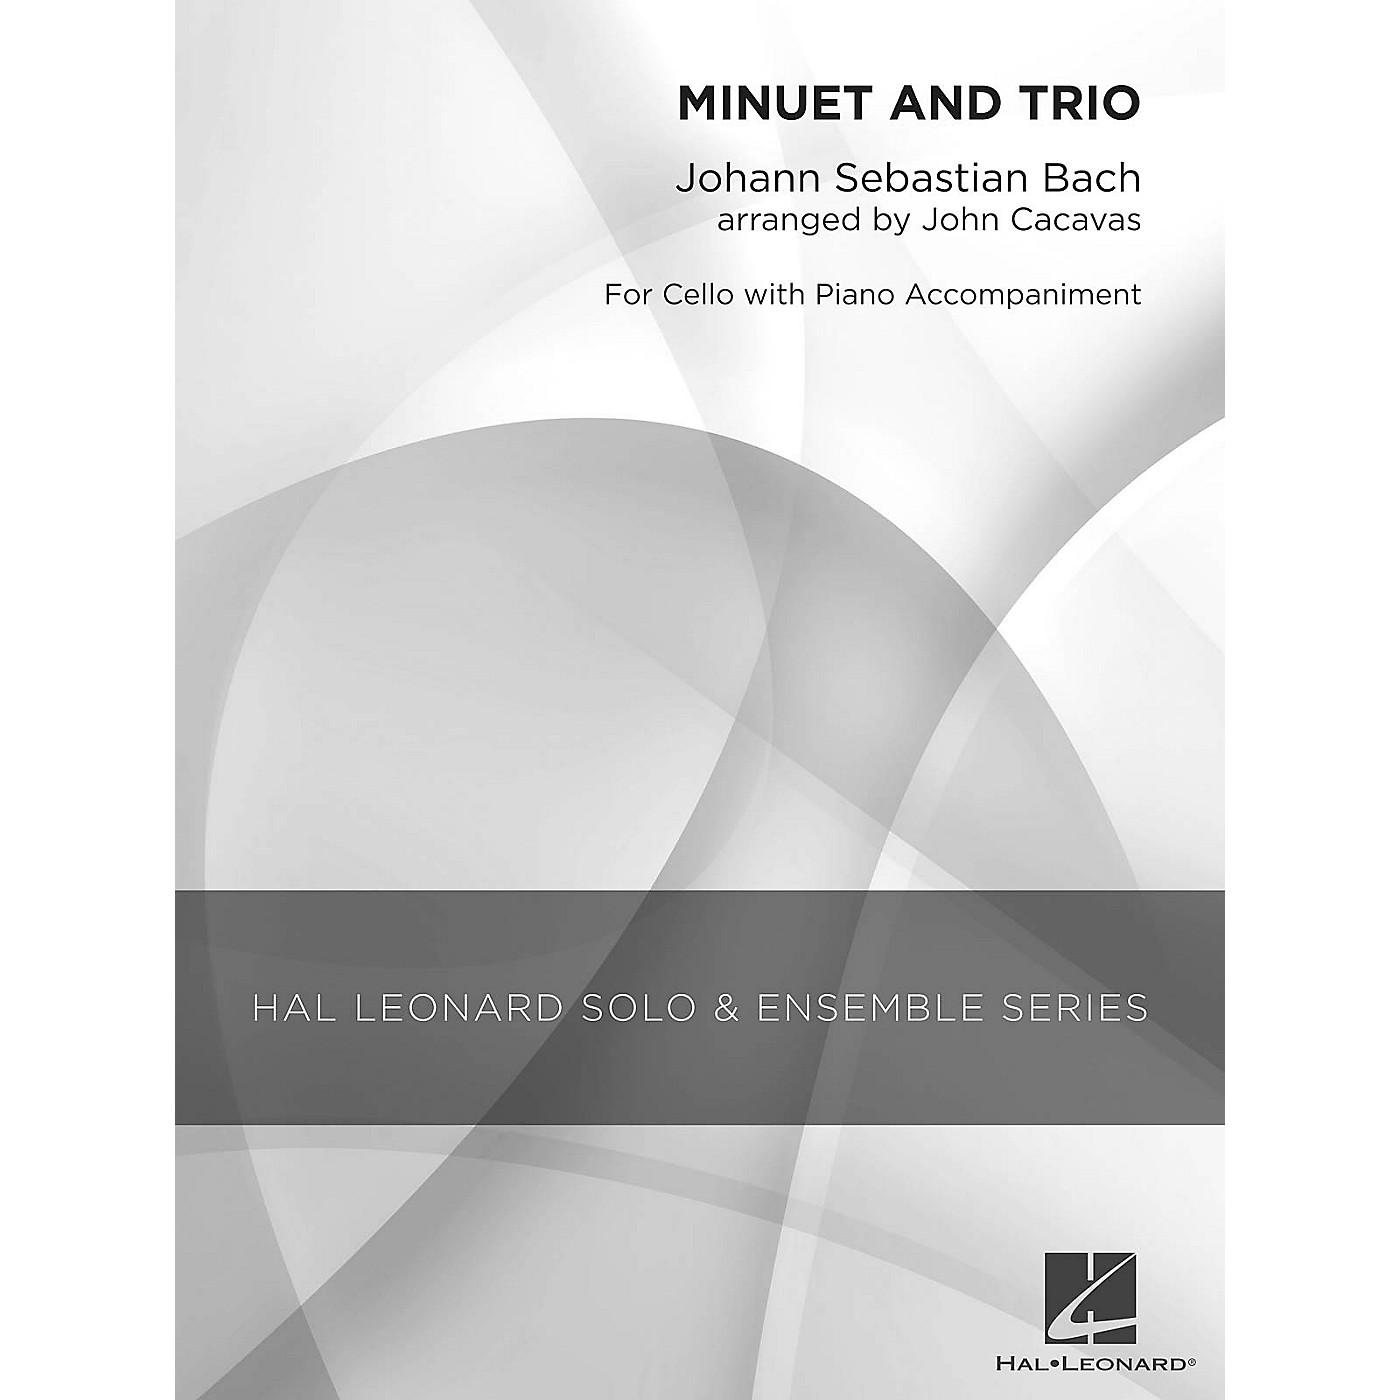 Hal Leonard Minuet and Trio (Grade 2.5 Cello Solo) Hal Leonard Solo & Ensemble Series Arranged by John Cacavas thumbnail